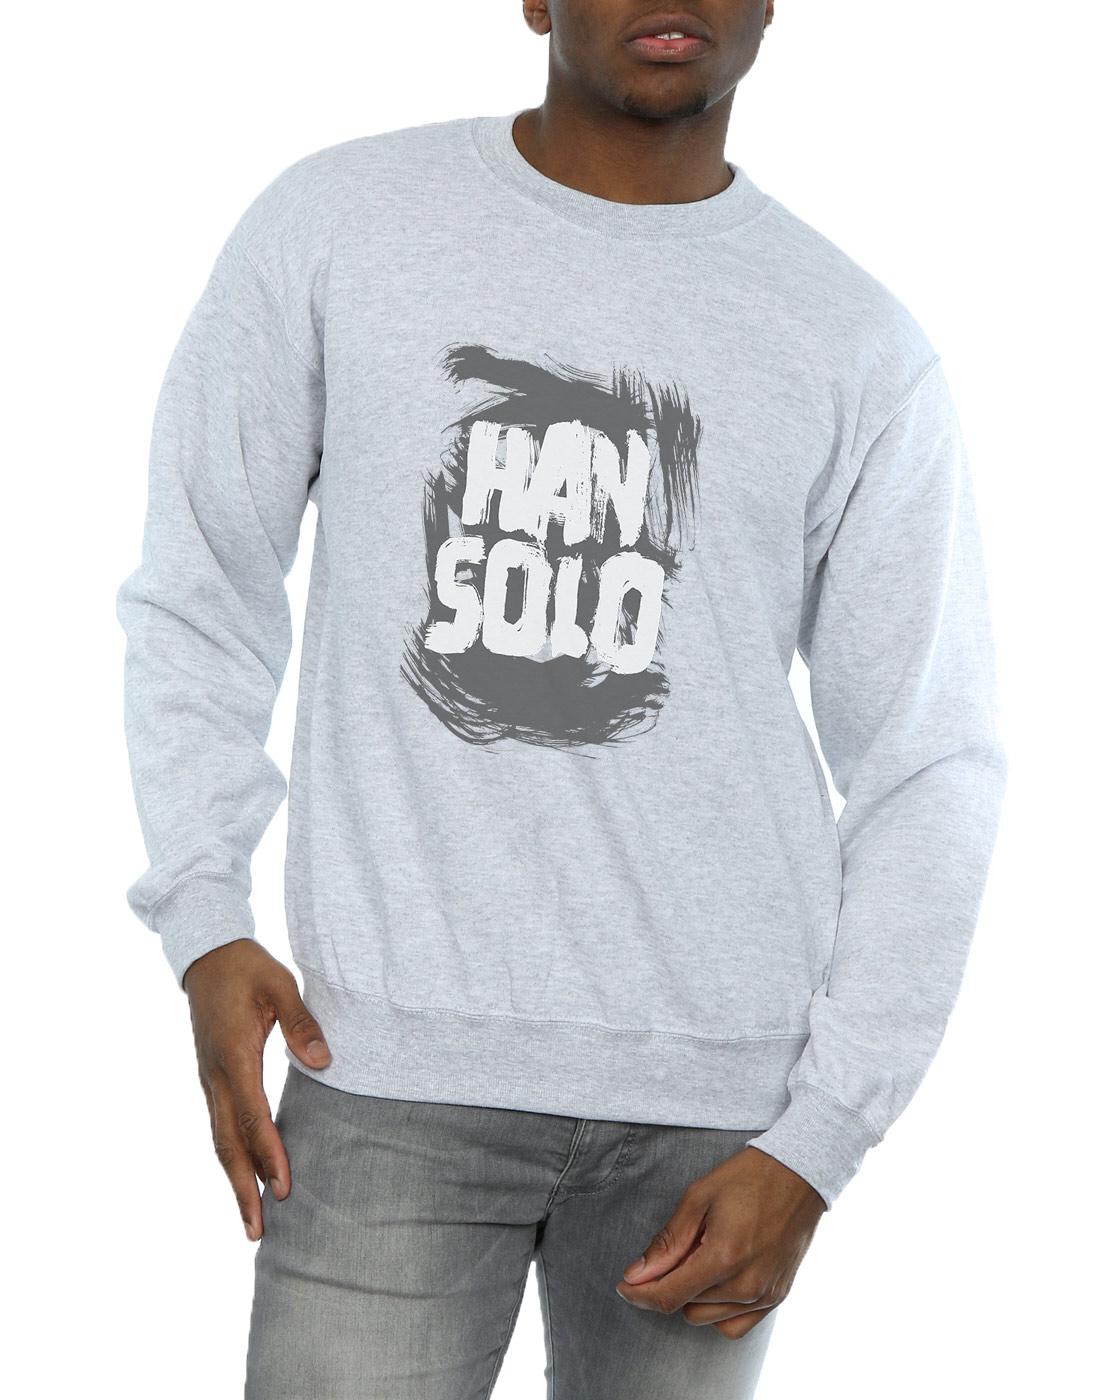 Shirt Wars Han Star Ebay Sweat Solo Text Homme qpYqwHaxR